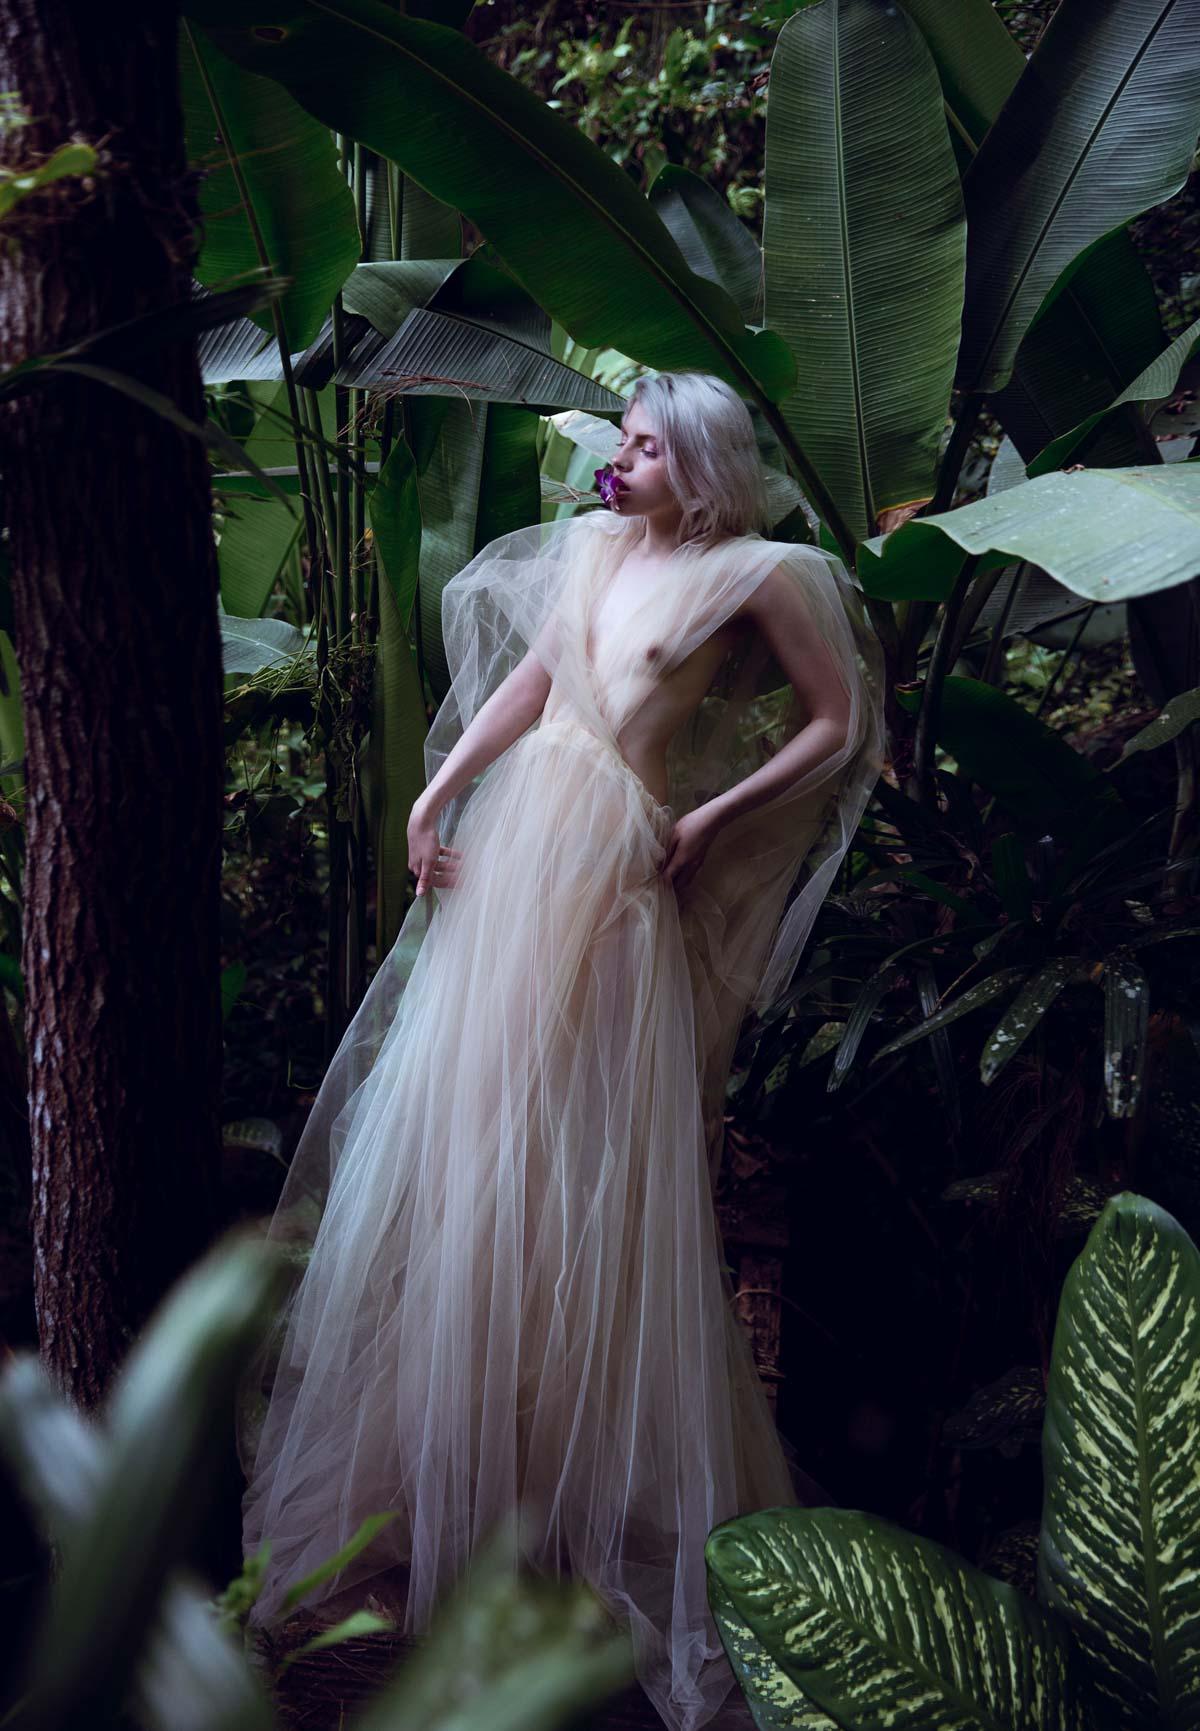 the_forest_magazine_amberly_valentine-neve-angie_angorro_0004